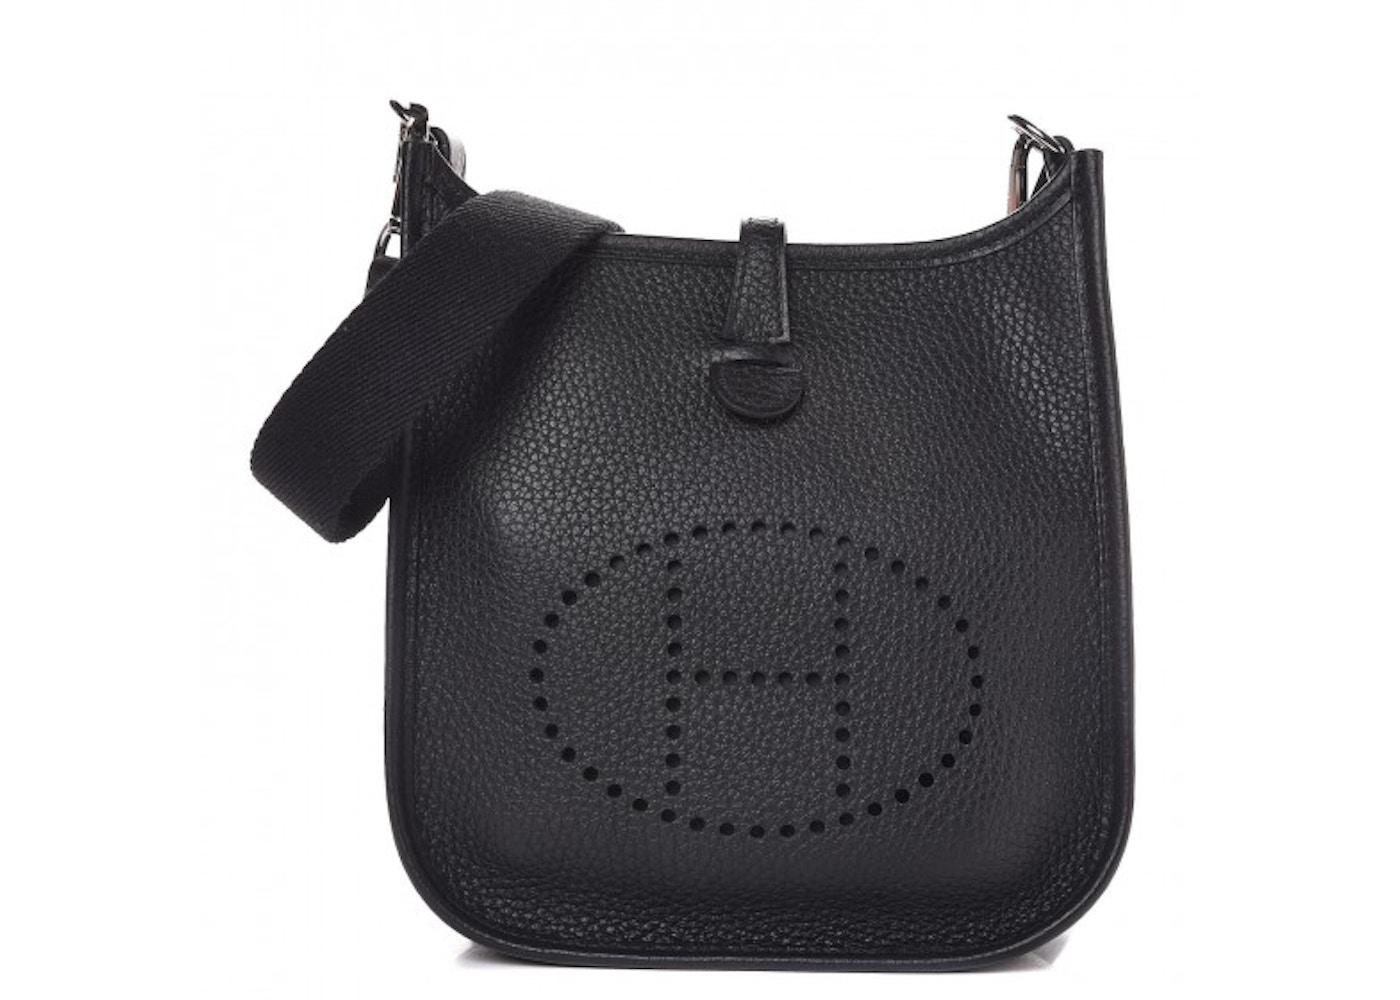 Buy   Sell Hermes Evelyne Handbags 2a5fc6c9b7ca7